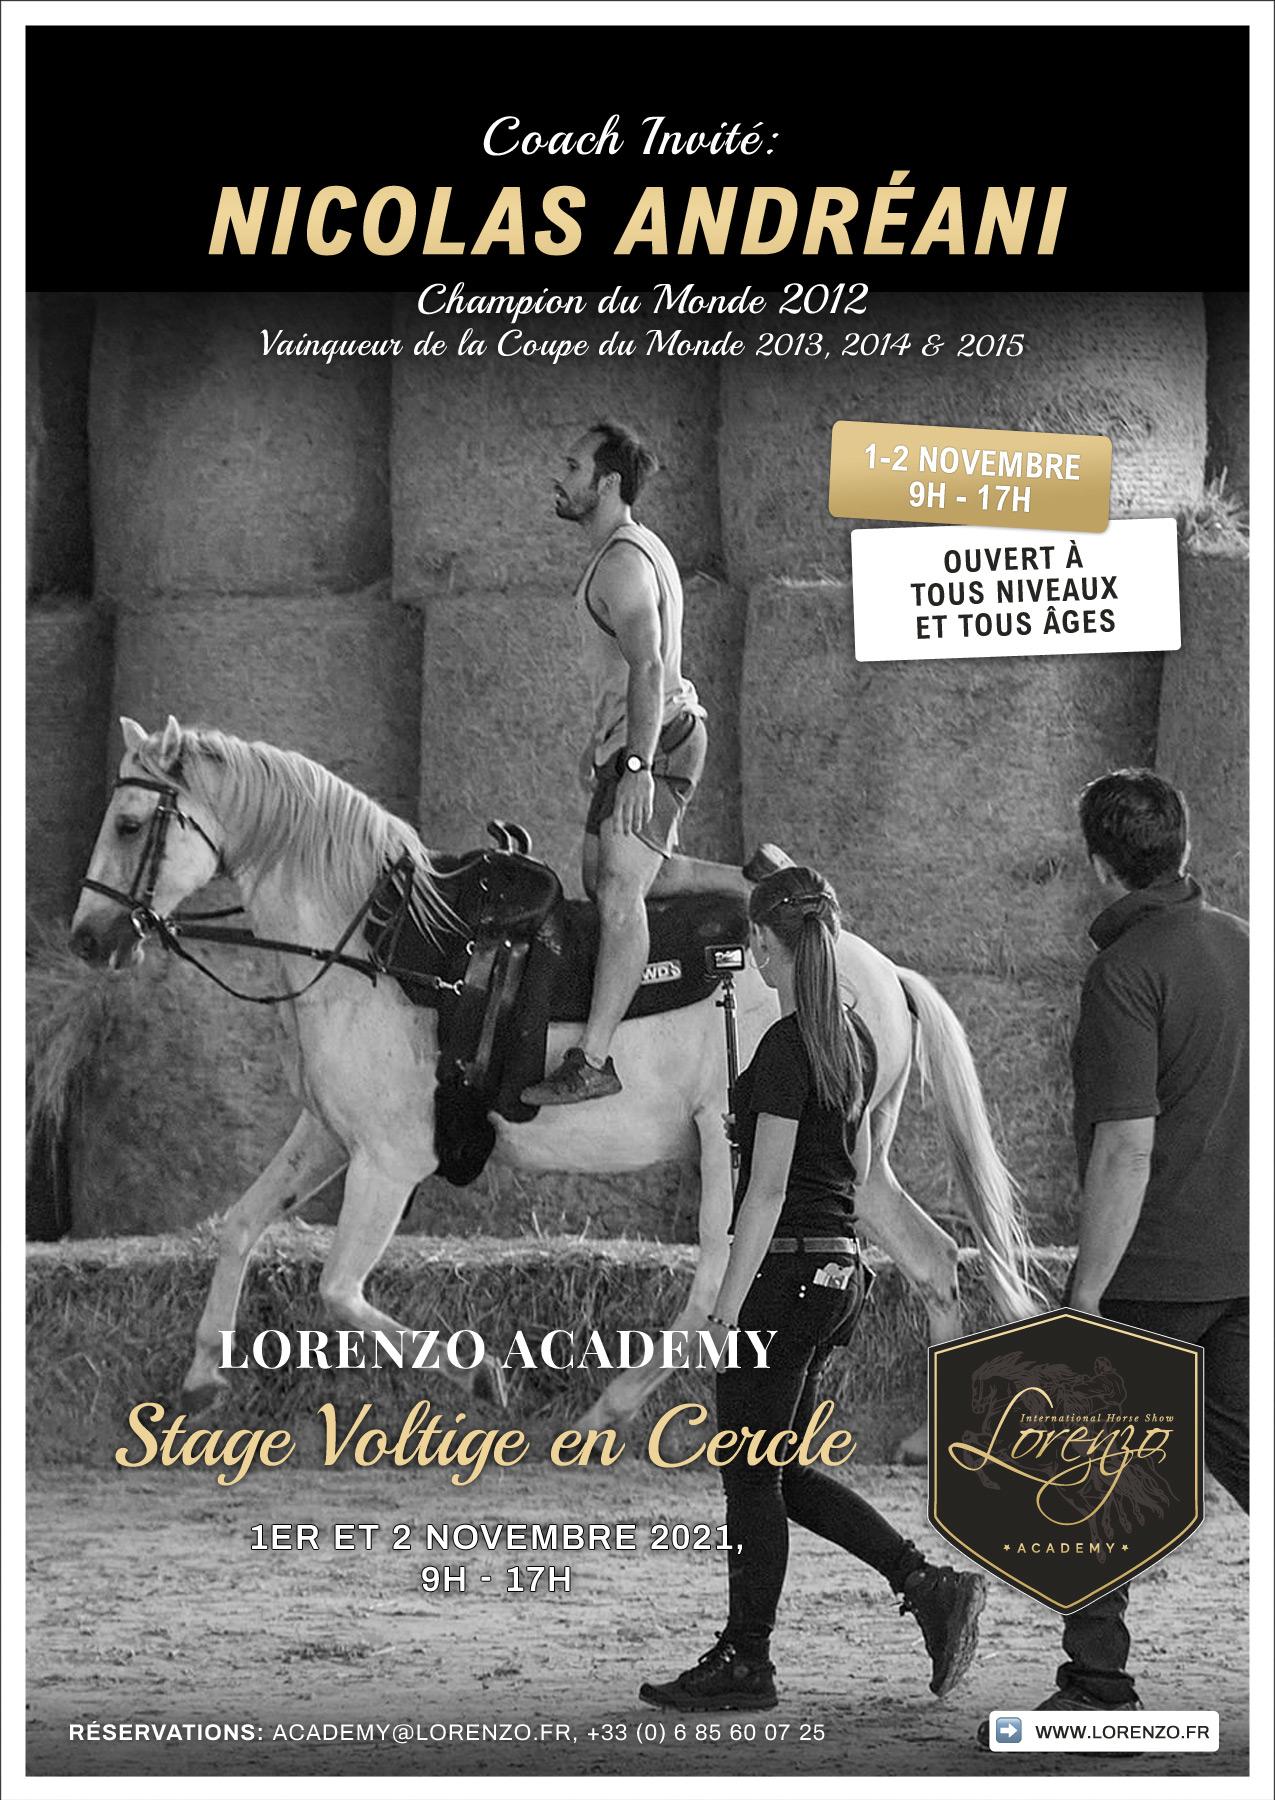 Stage voltige en cercle avec Nicolas Andreani